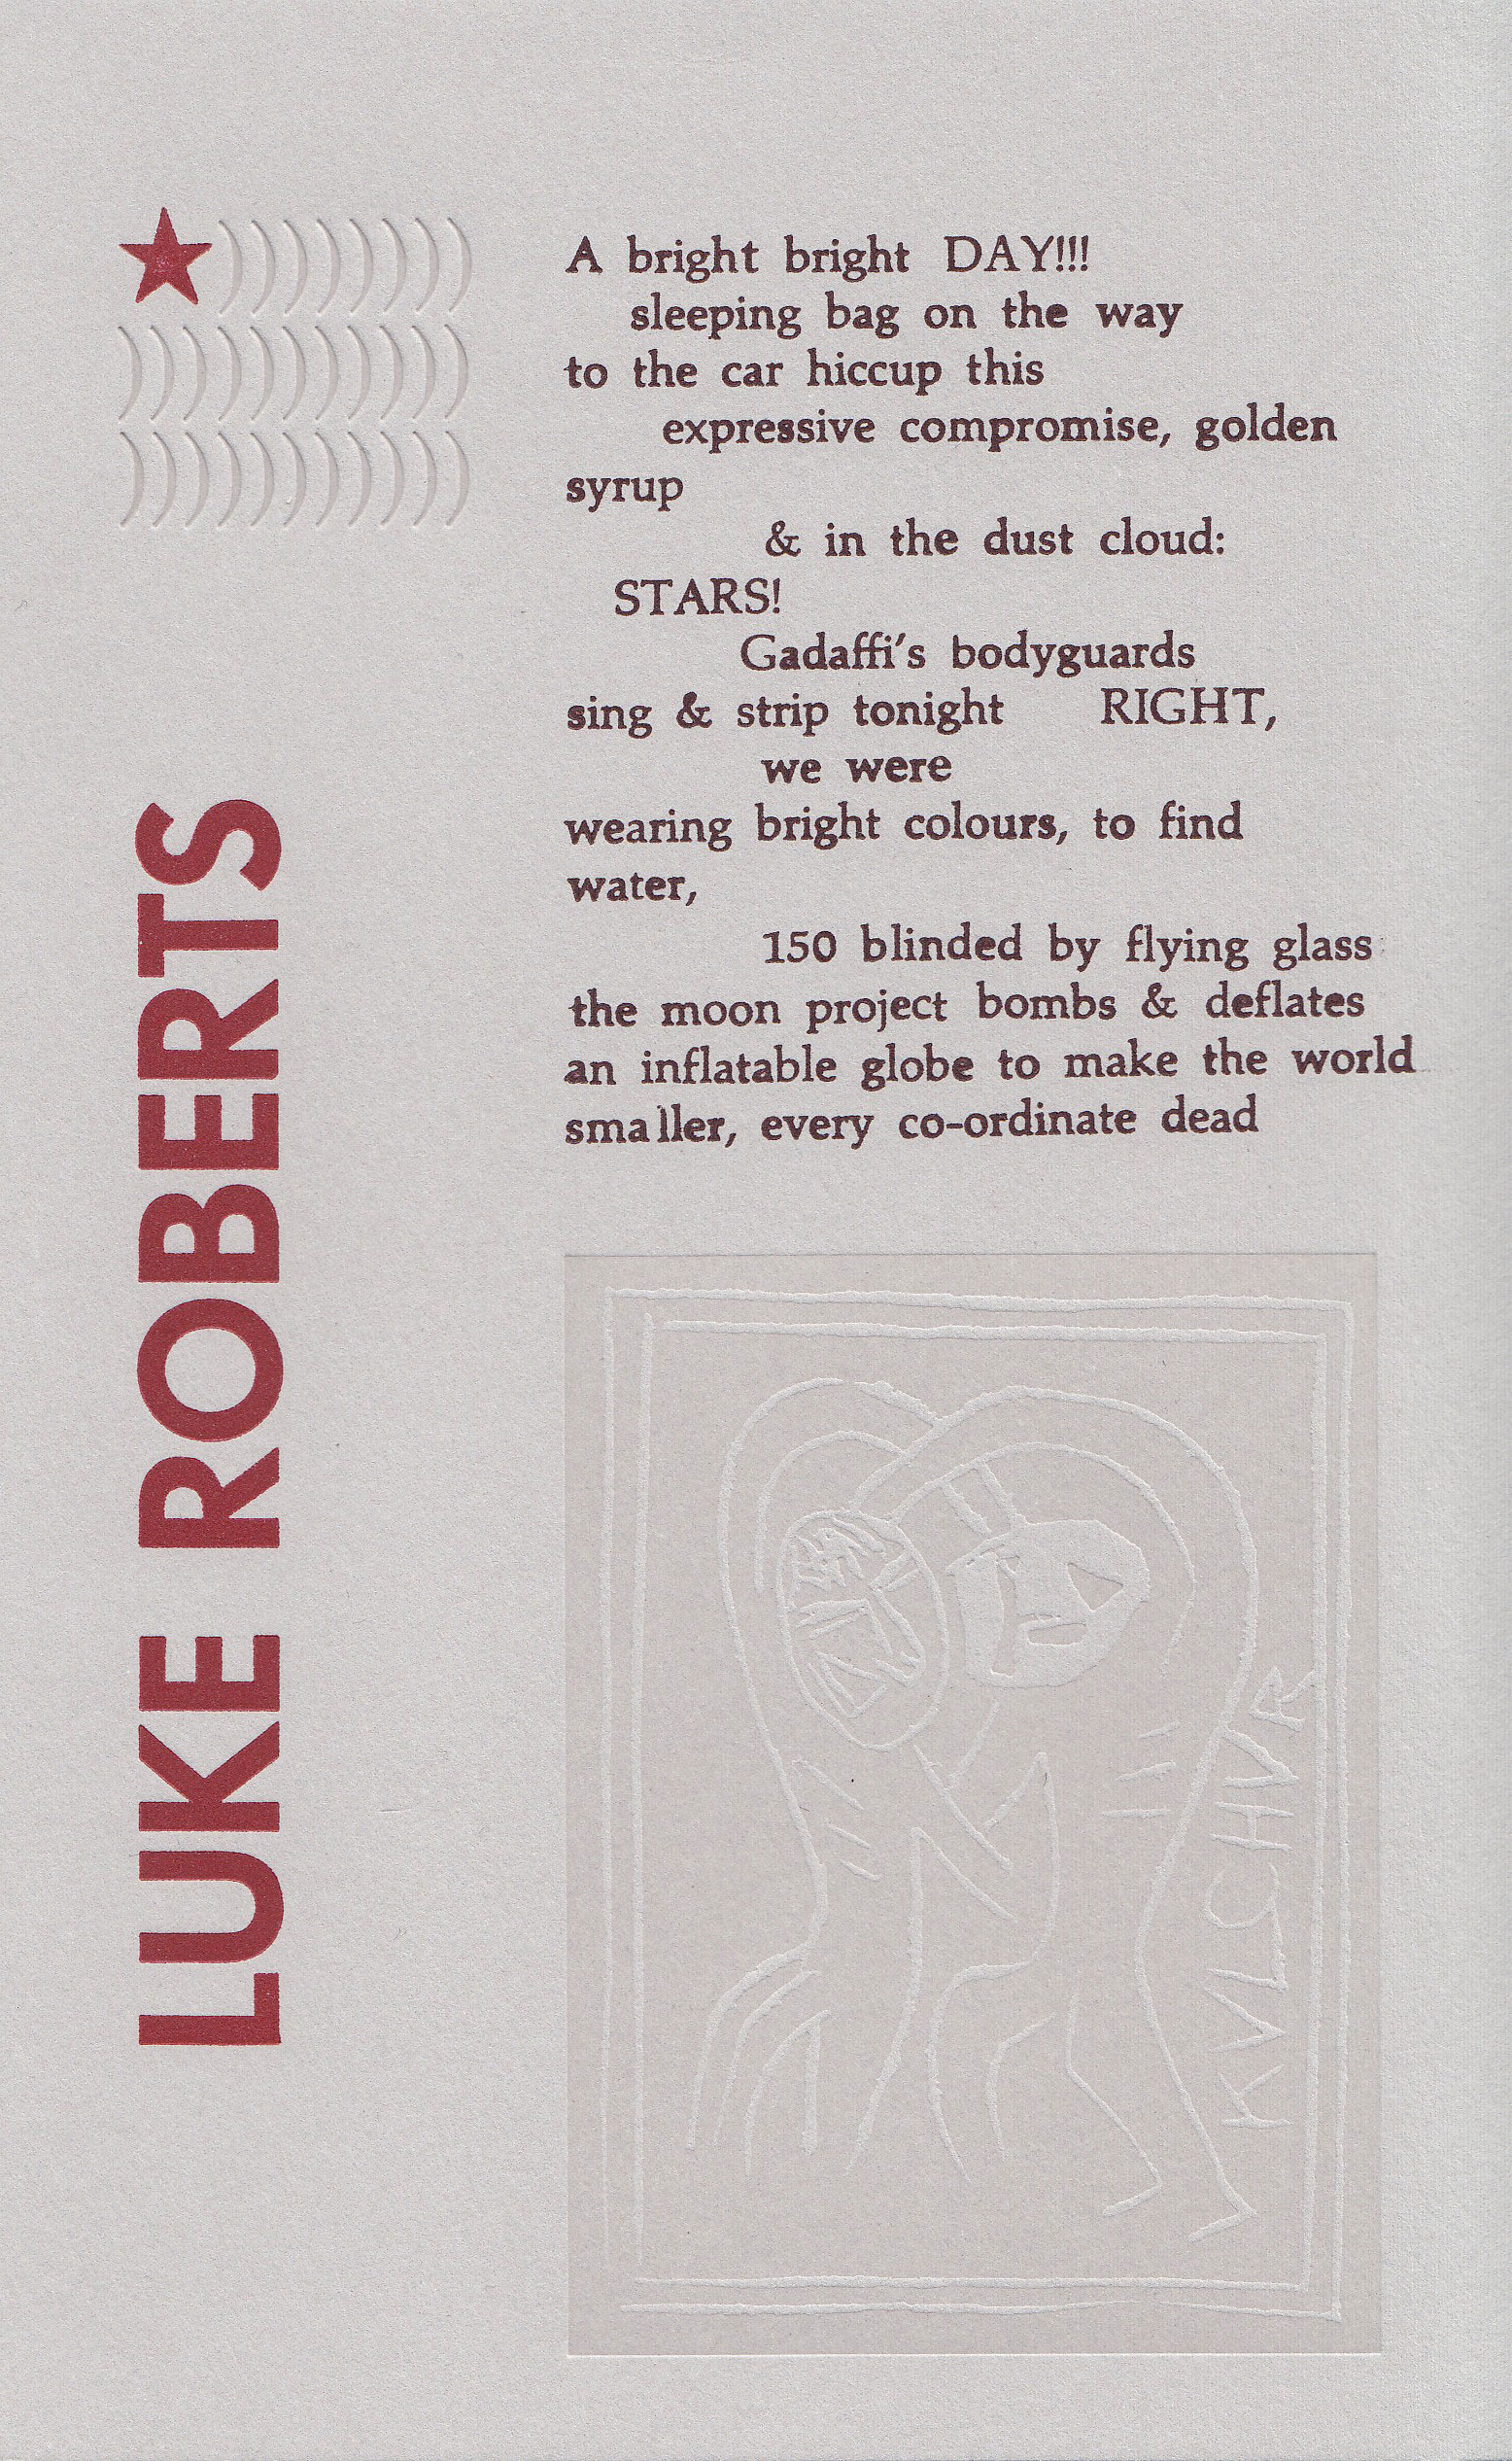 Luke-Roberts-b-side